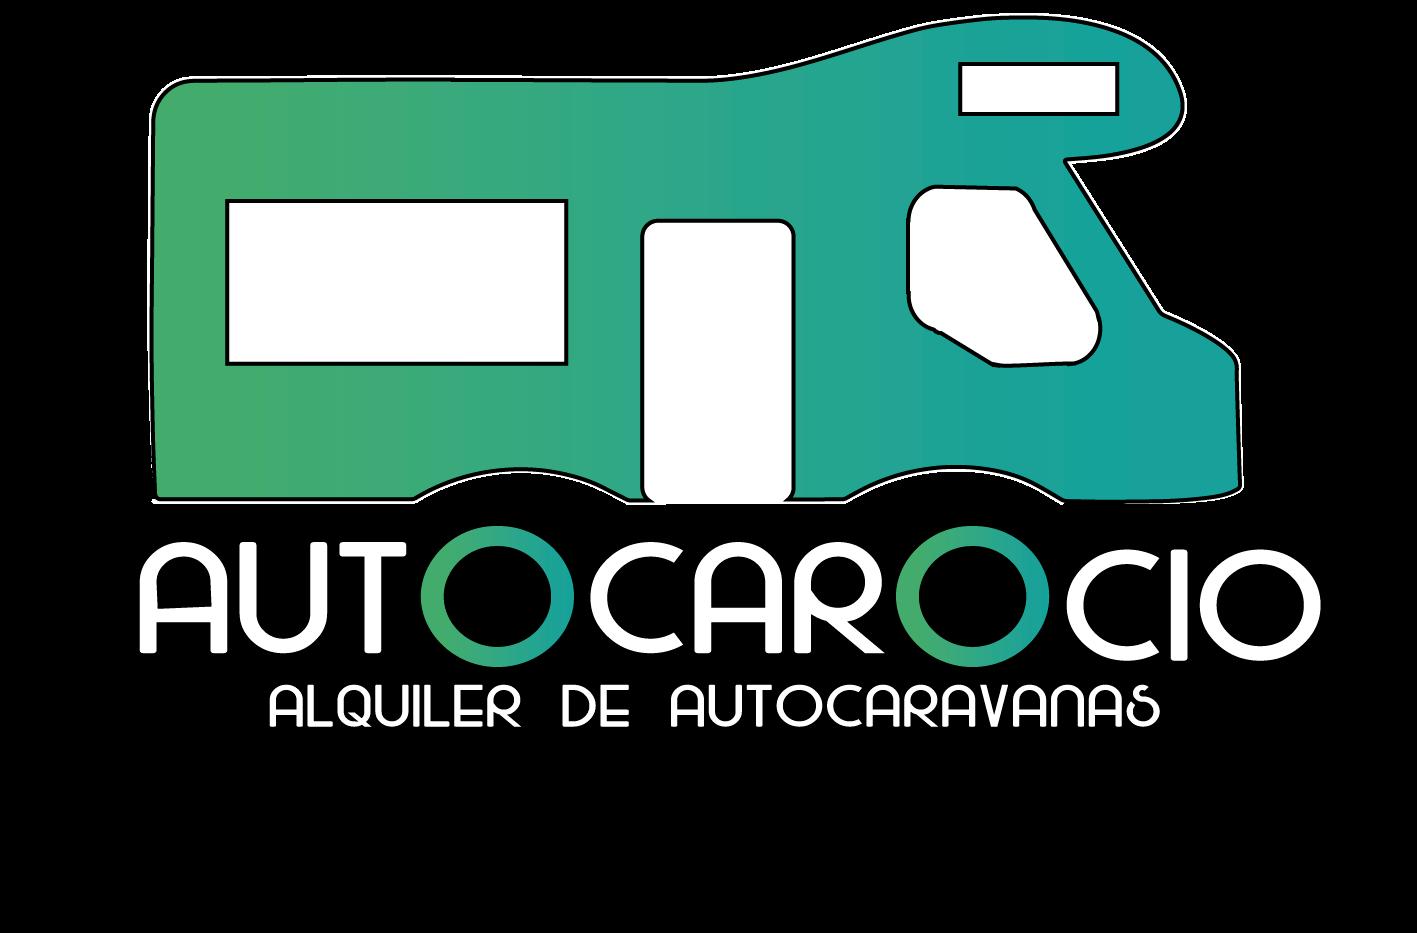 autocarocio.png